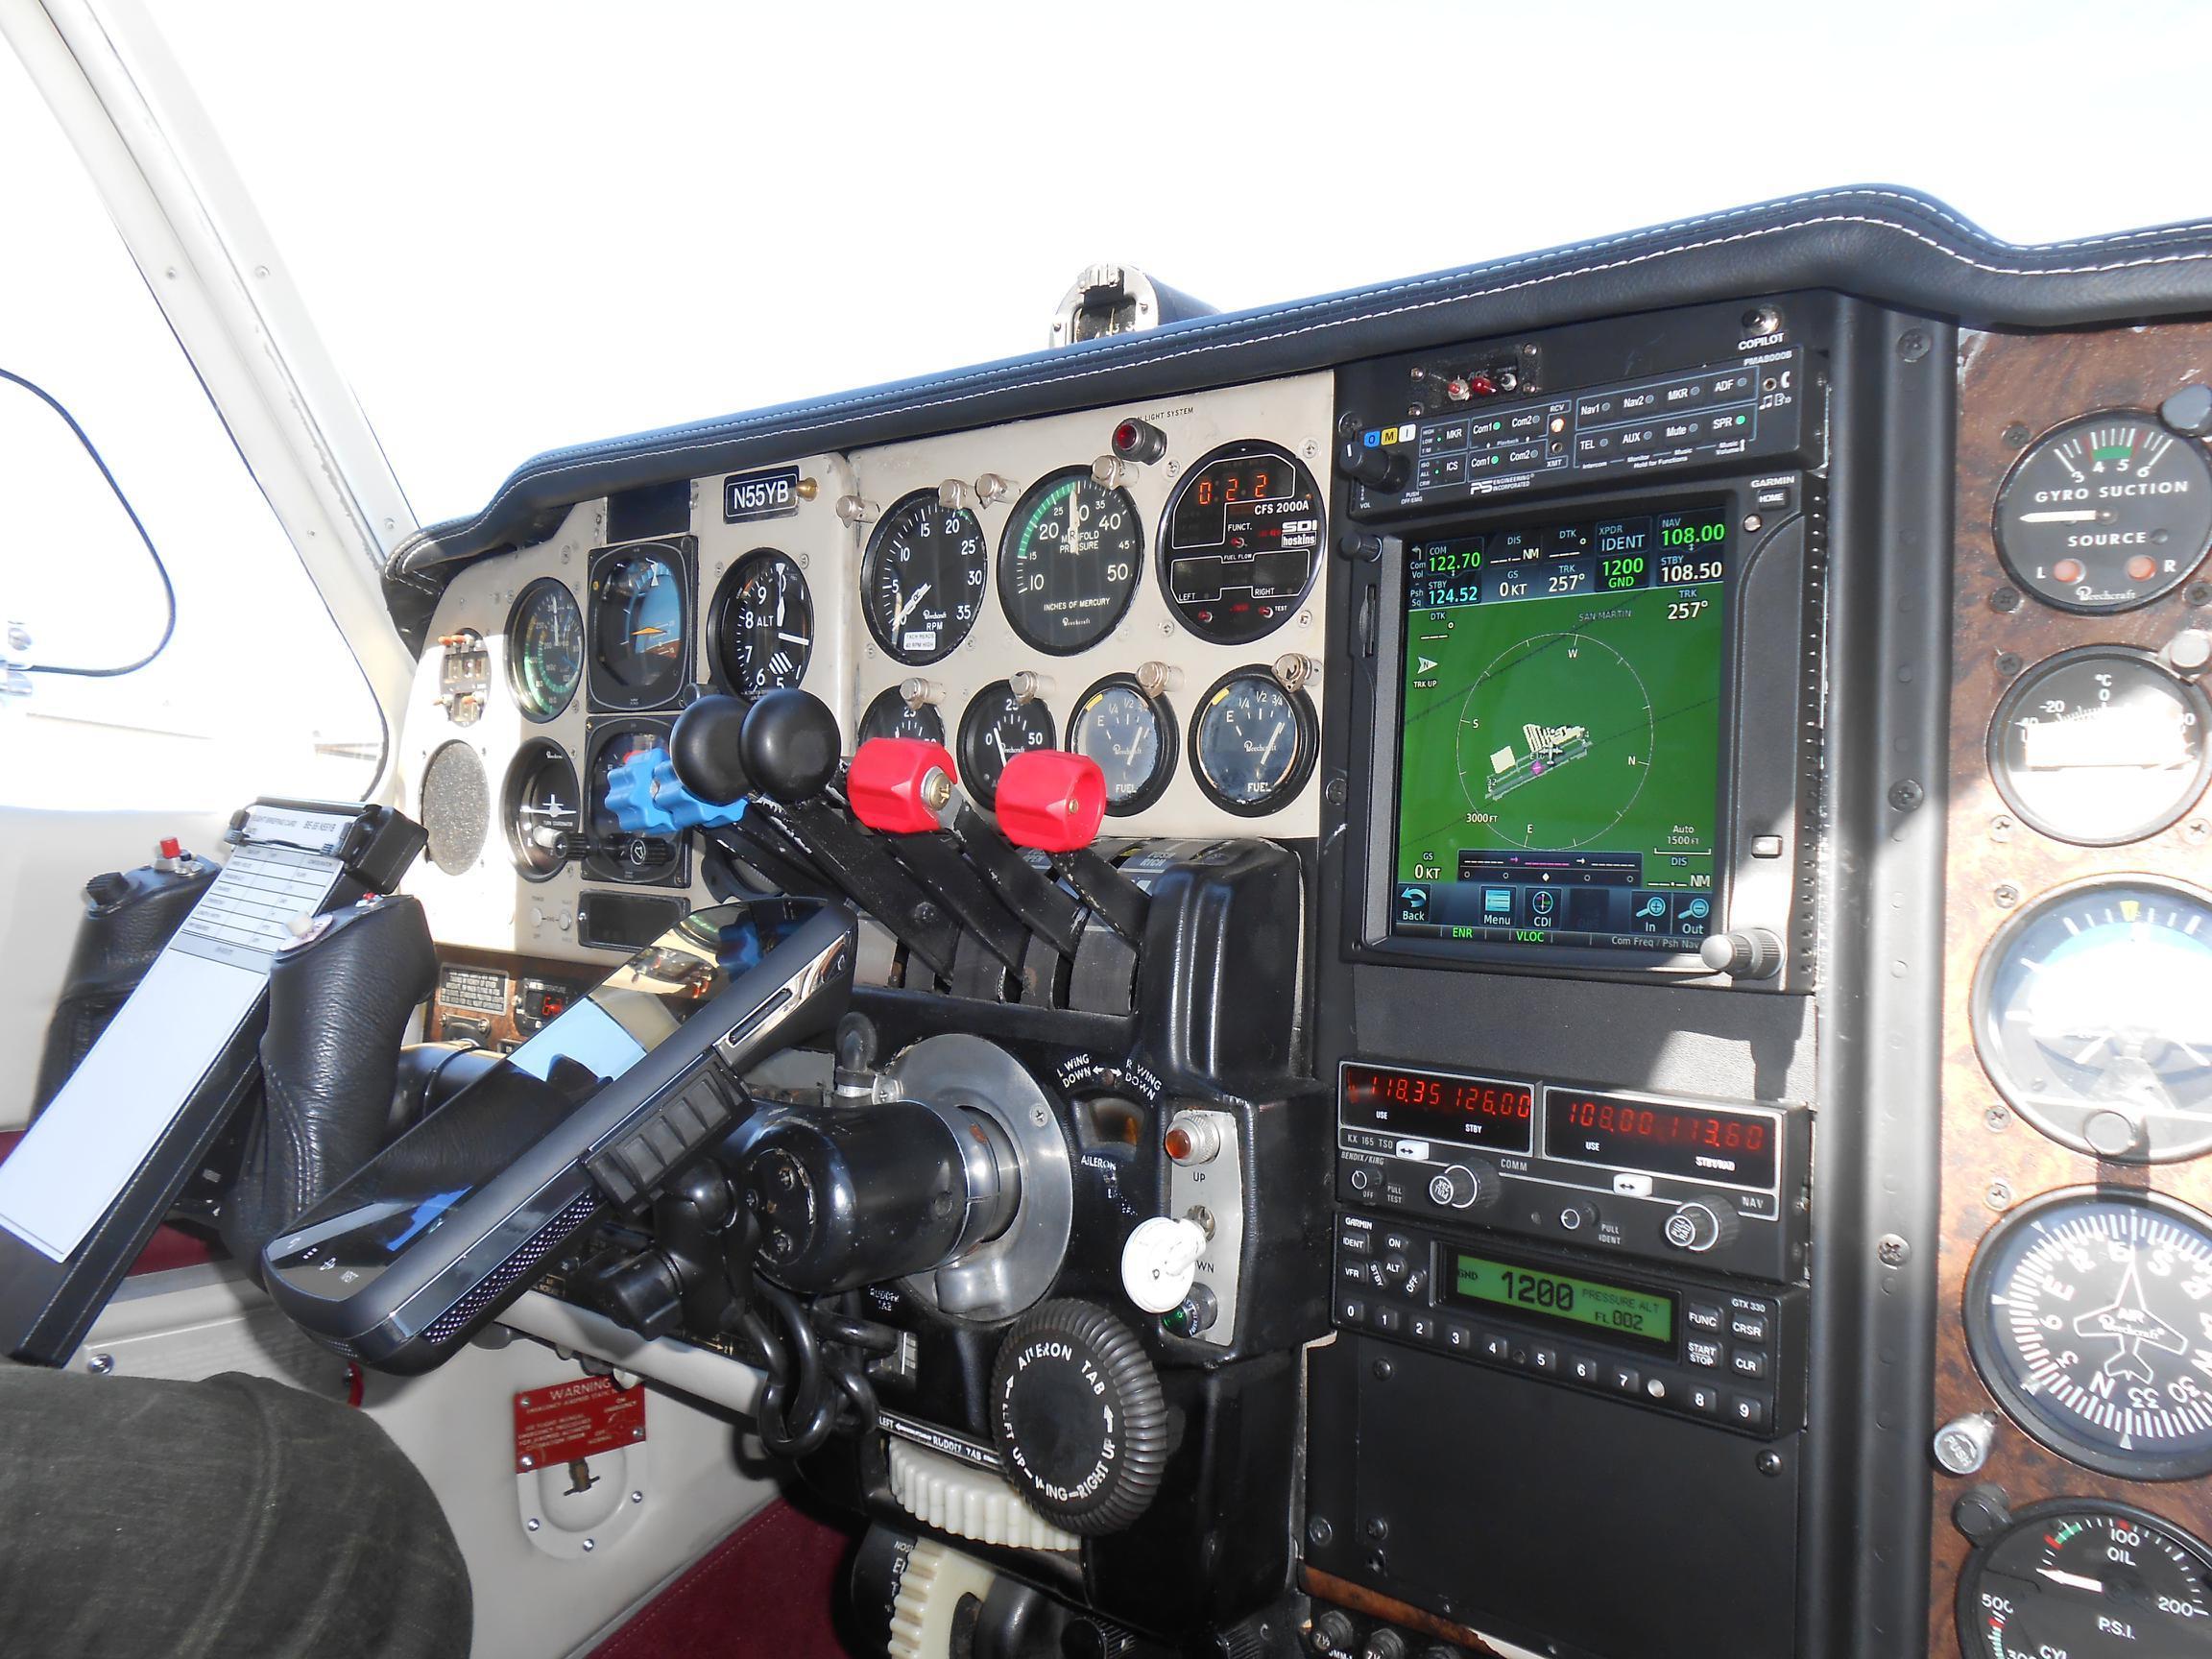 RPM/Propeller Control Knob